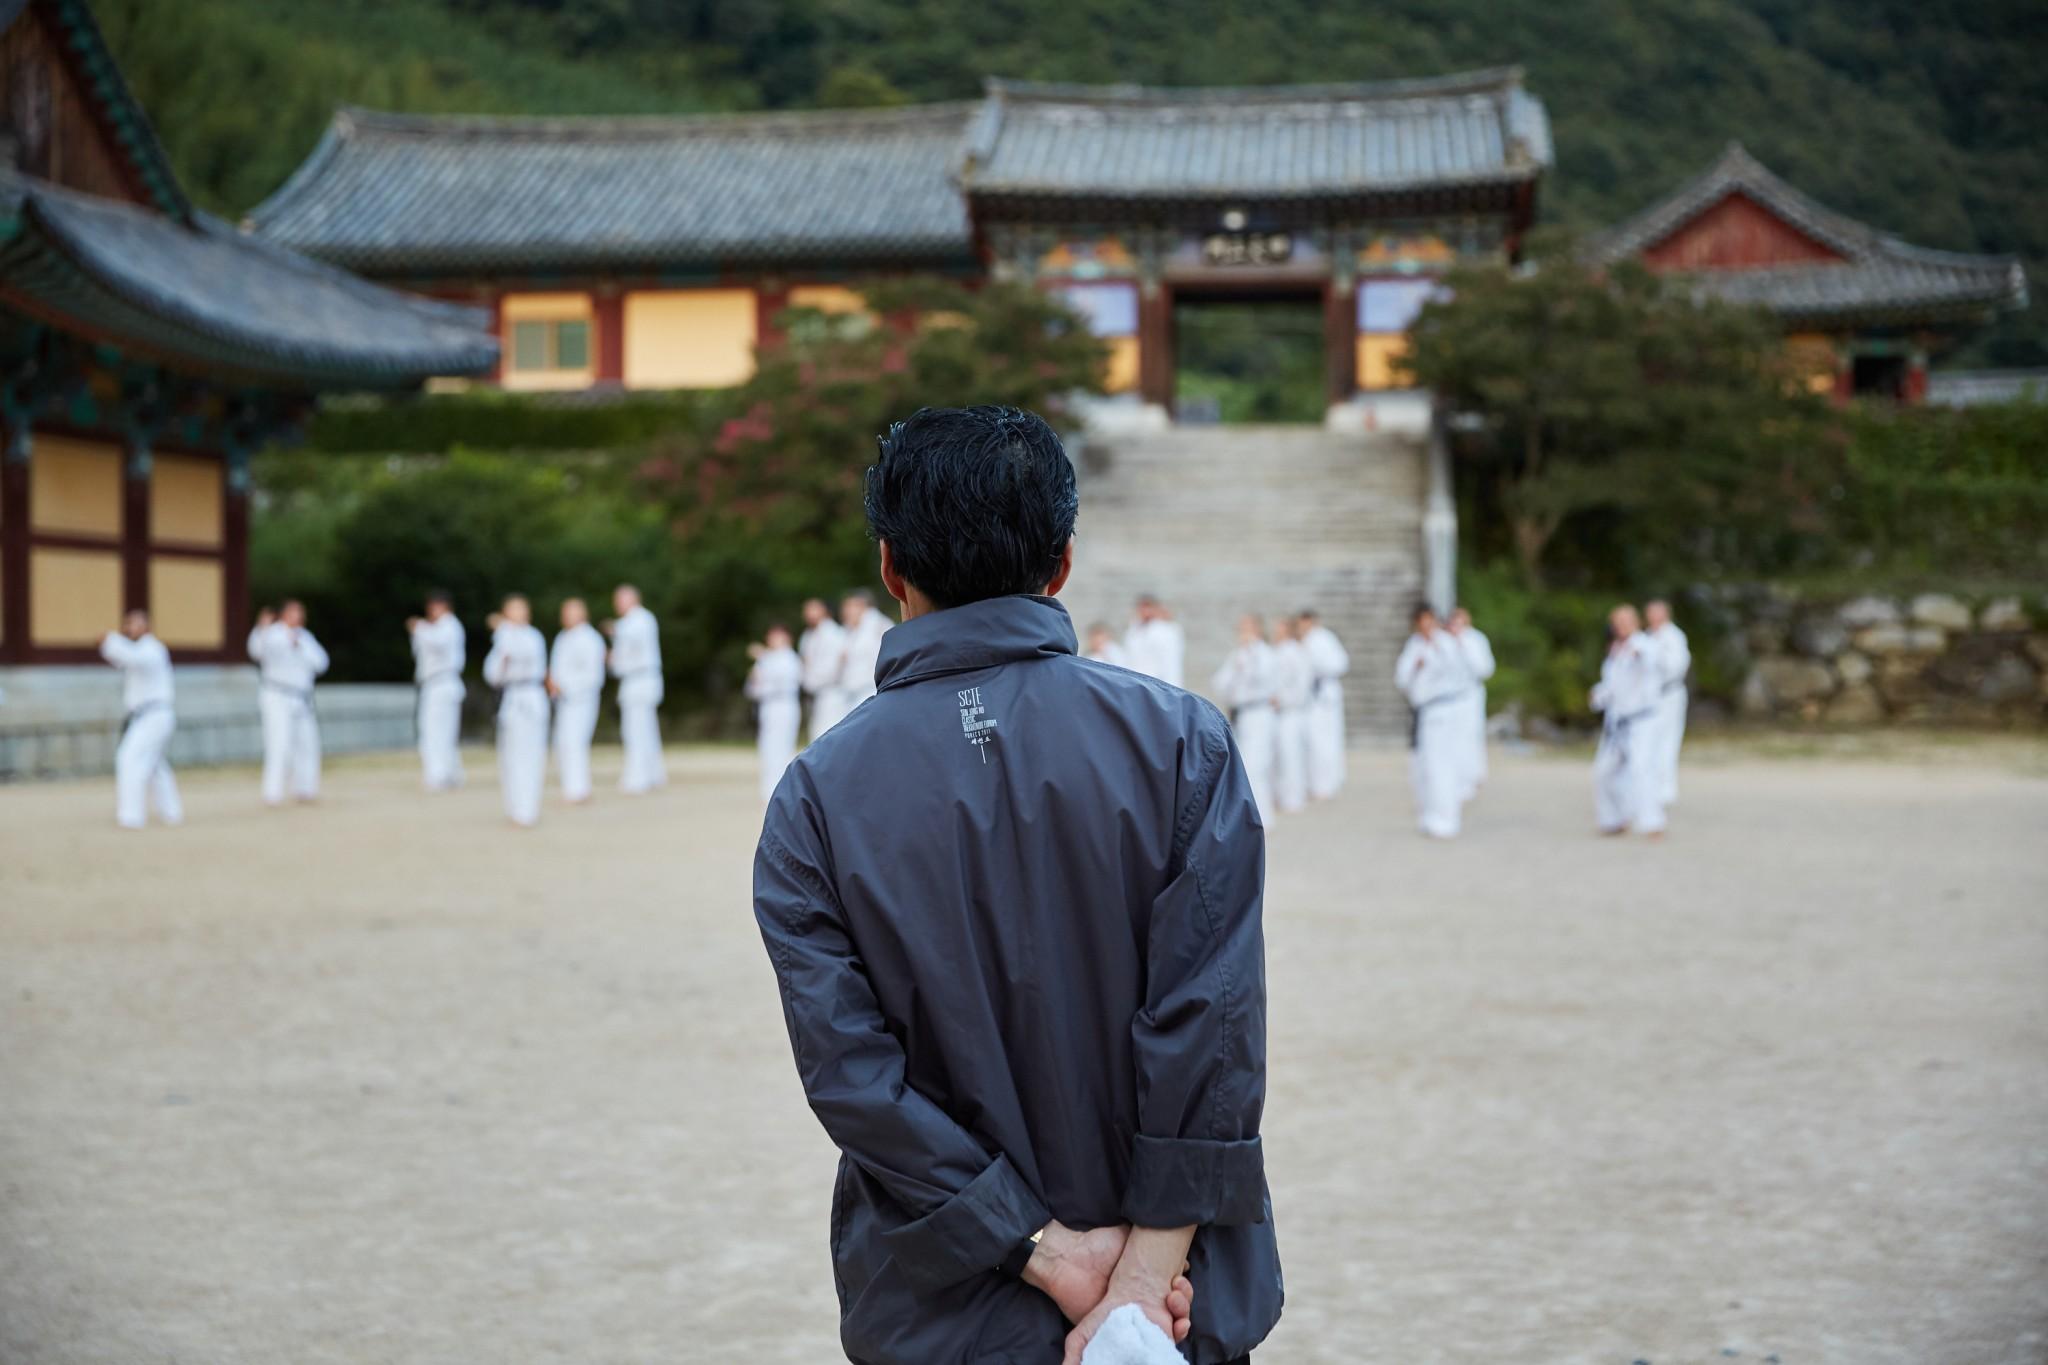 Training vor einem Tempel in Korea - Foto: Alexander Bagli, SCTE